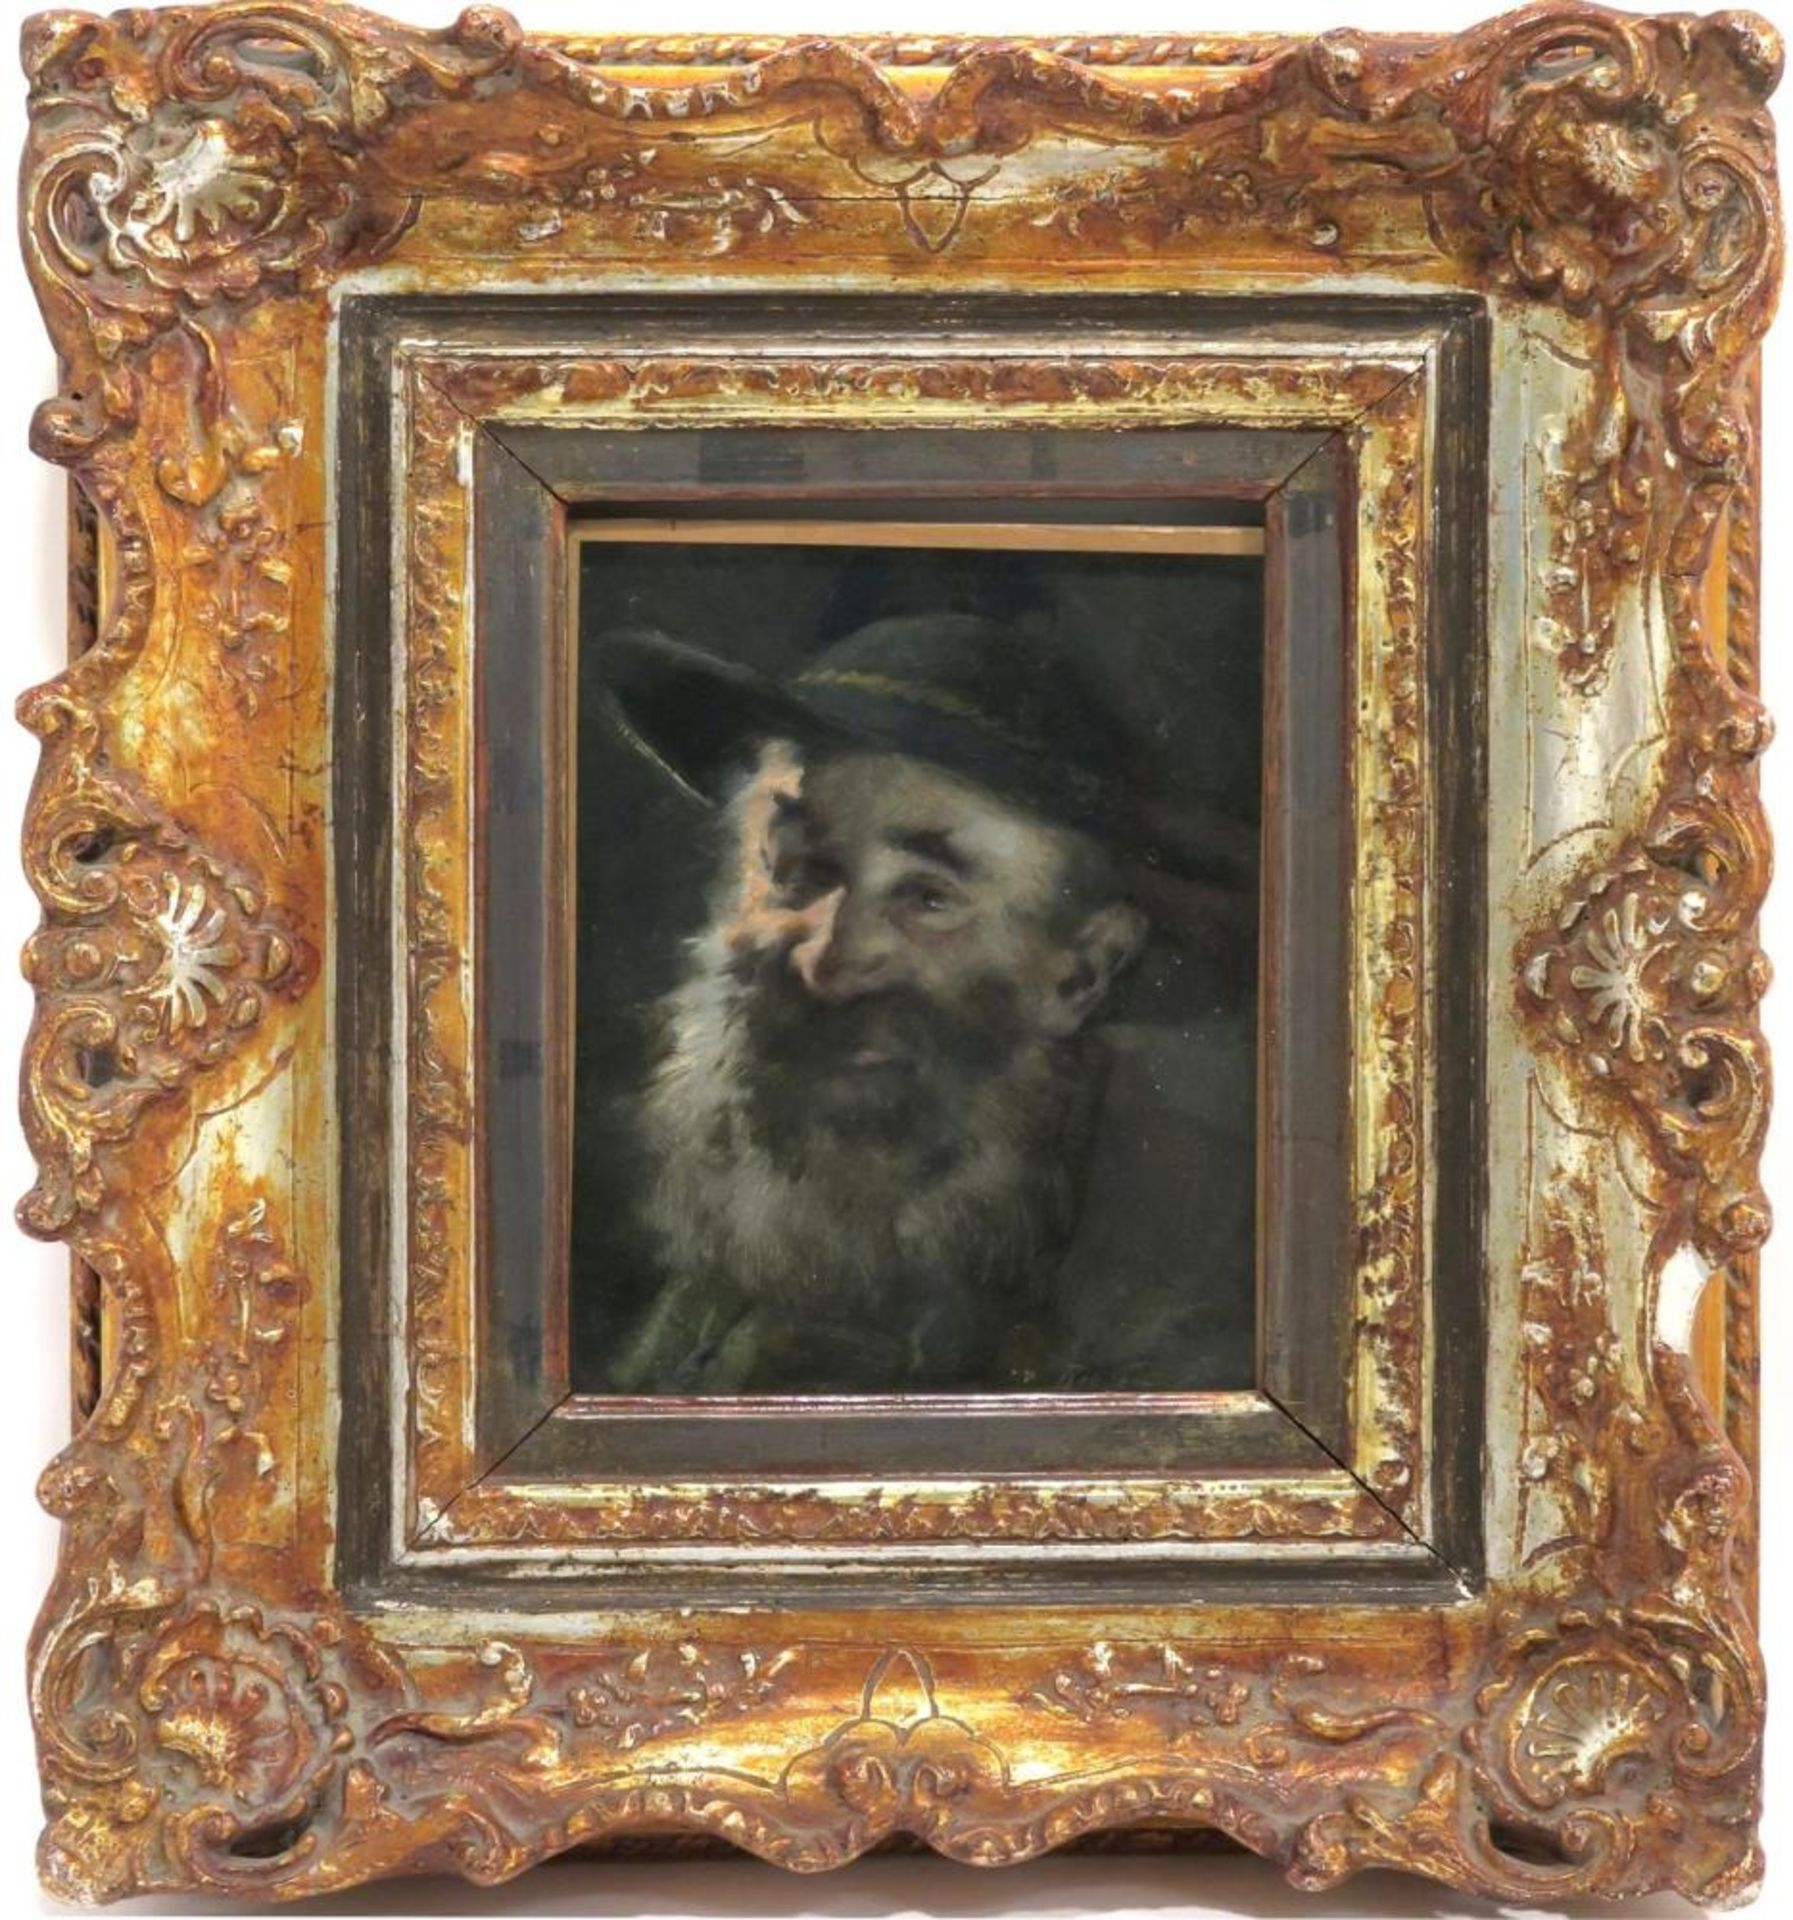 Porträt eines Bärtigen